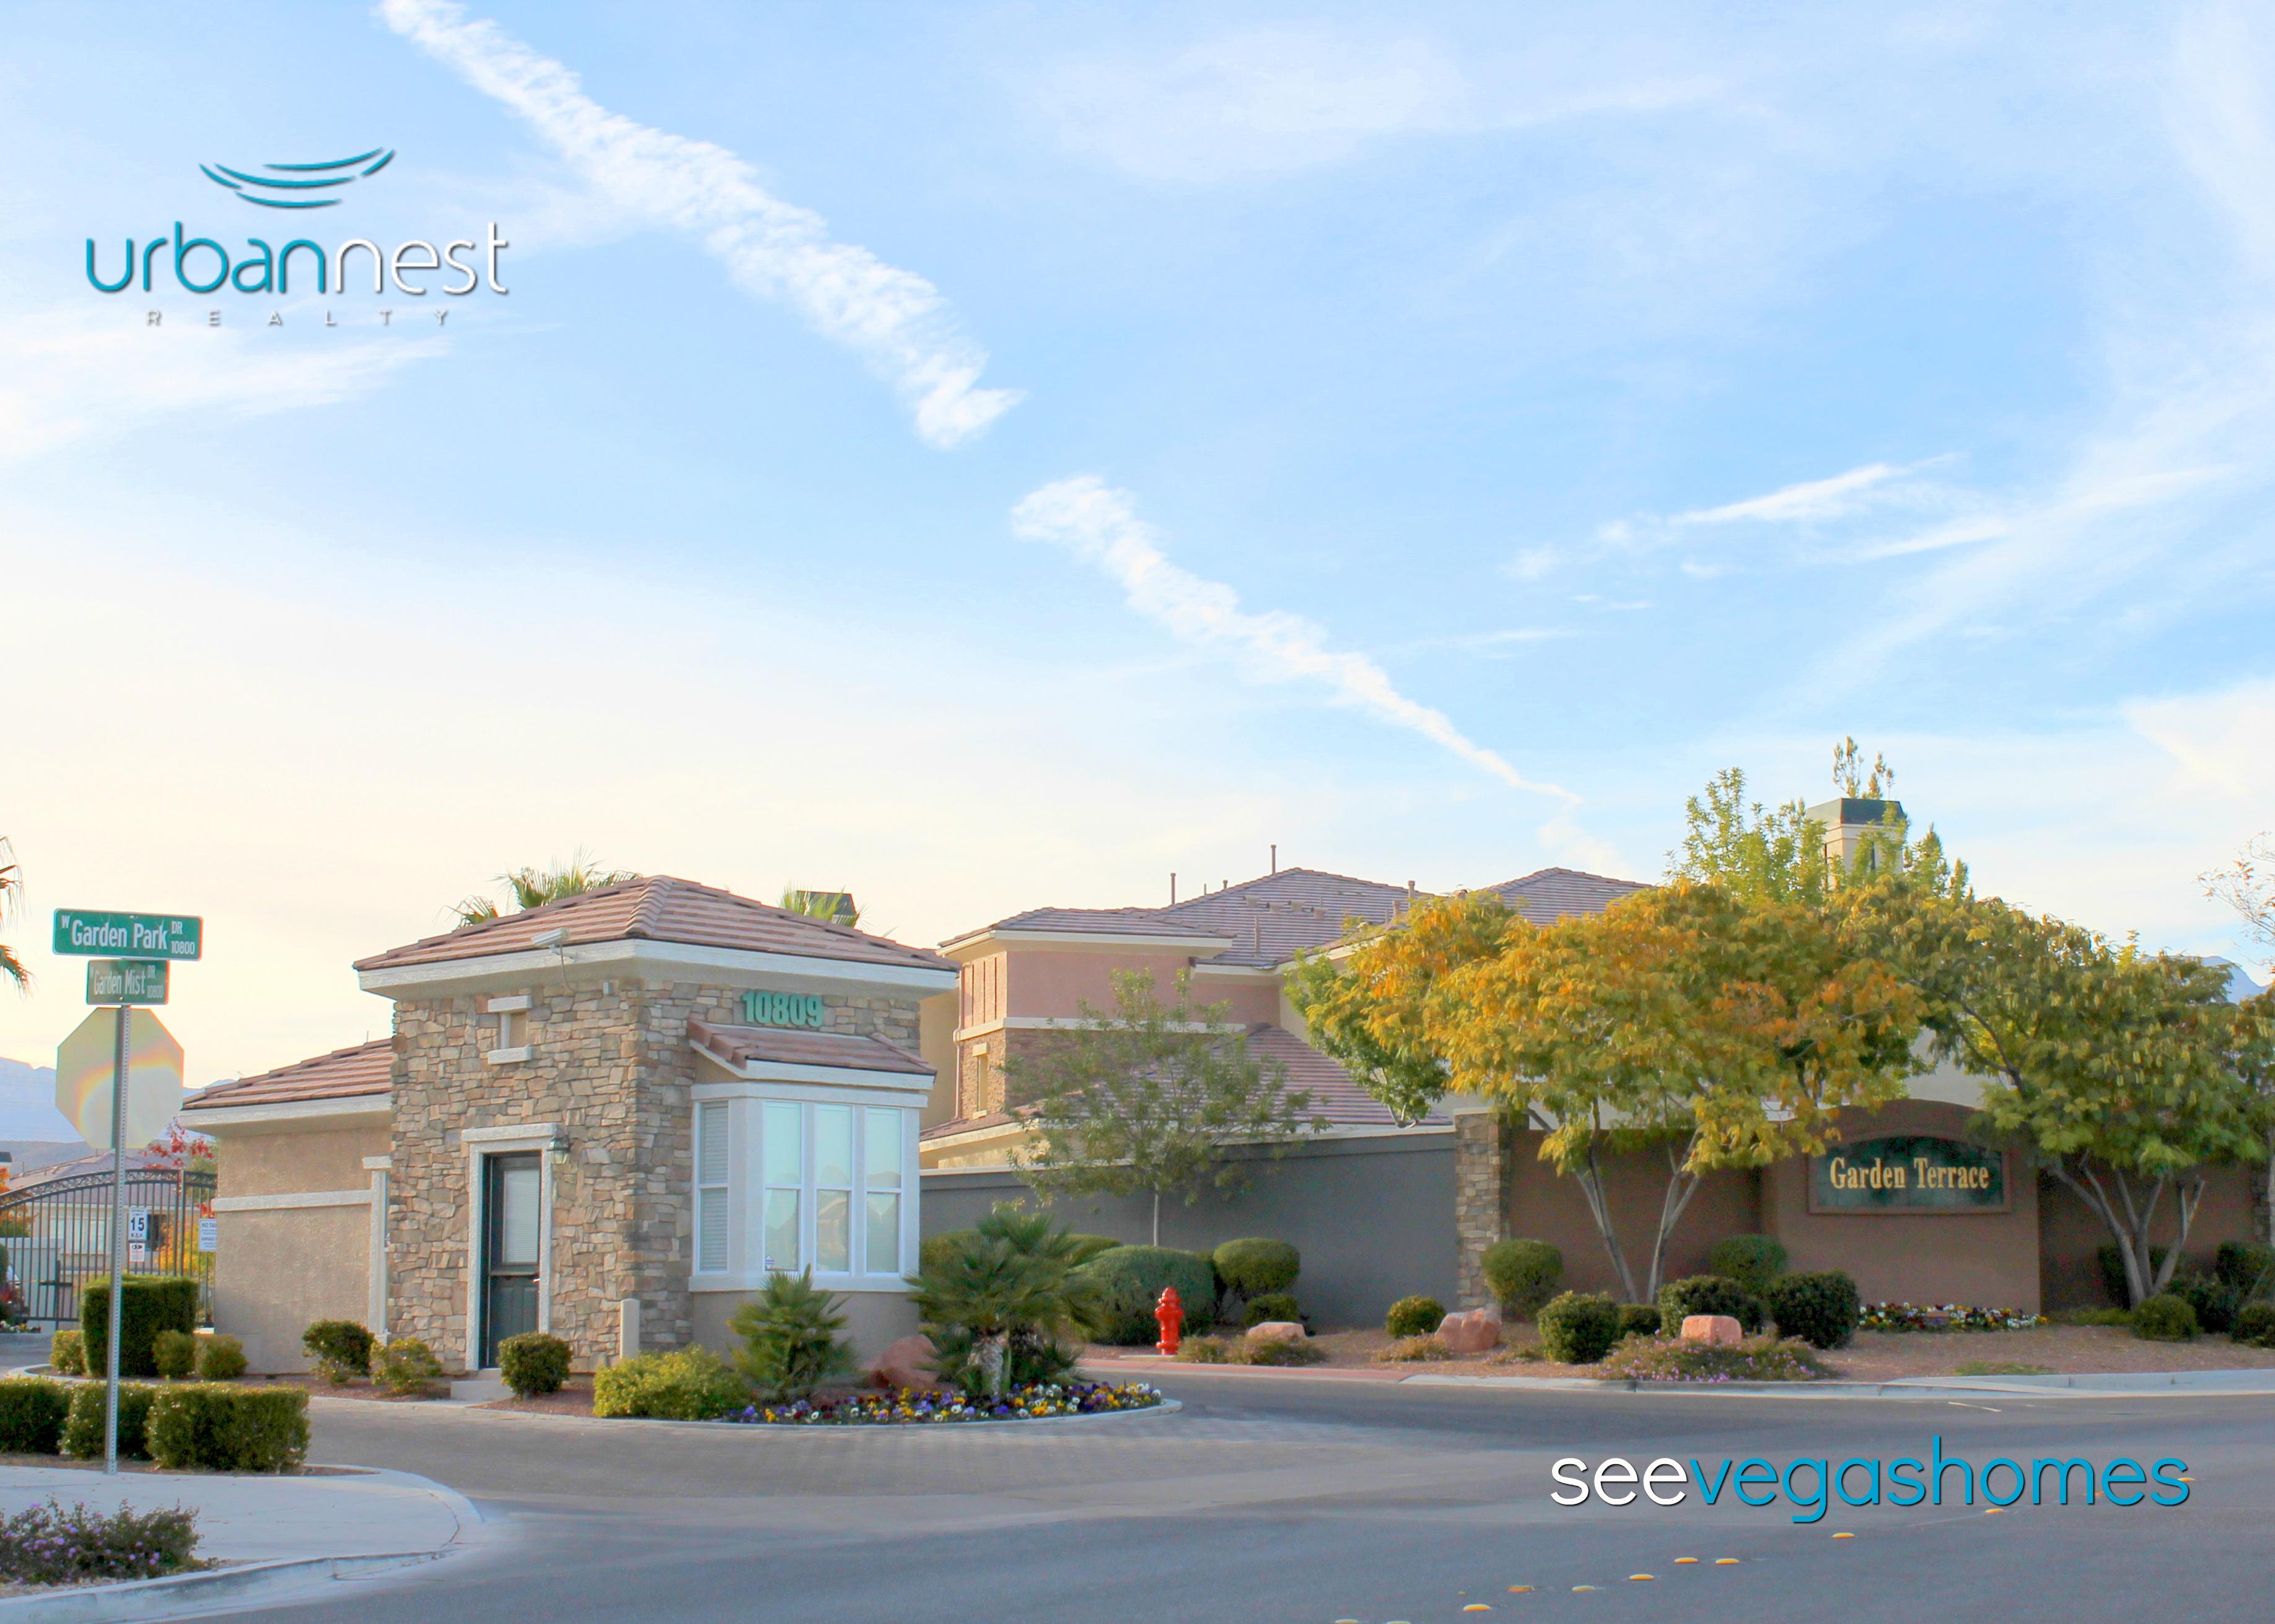 Garden Terrace Condos in Summerlin Las Vegas NV 89135 SeeVegasHomes